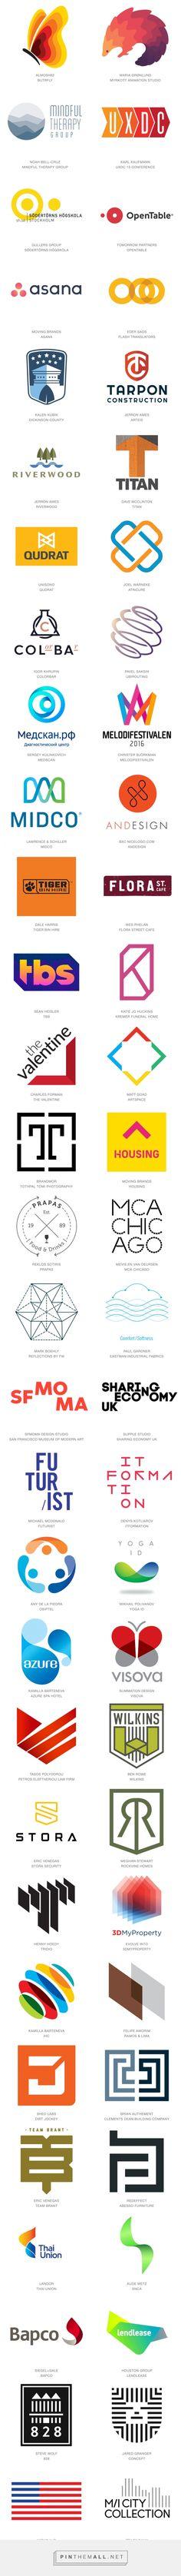 2016 Logo Trends | LogoLounge: Ombré, Circles, Half and Half, Linked, Stimming, Dog Eared, Corners, Line Dash, Off Shift, Curls, Pocket Shield, Slices, Letter Block, Benders, Bars